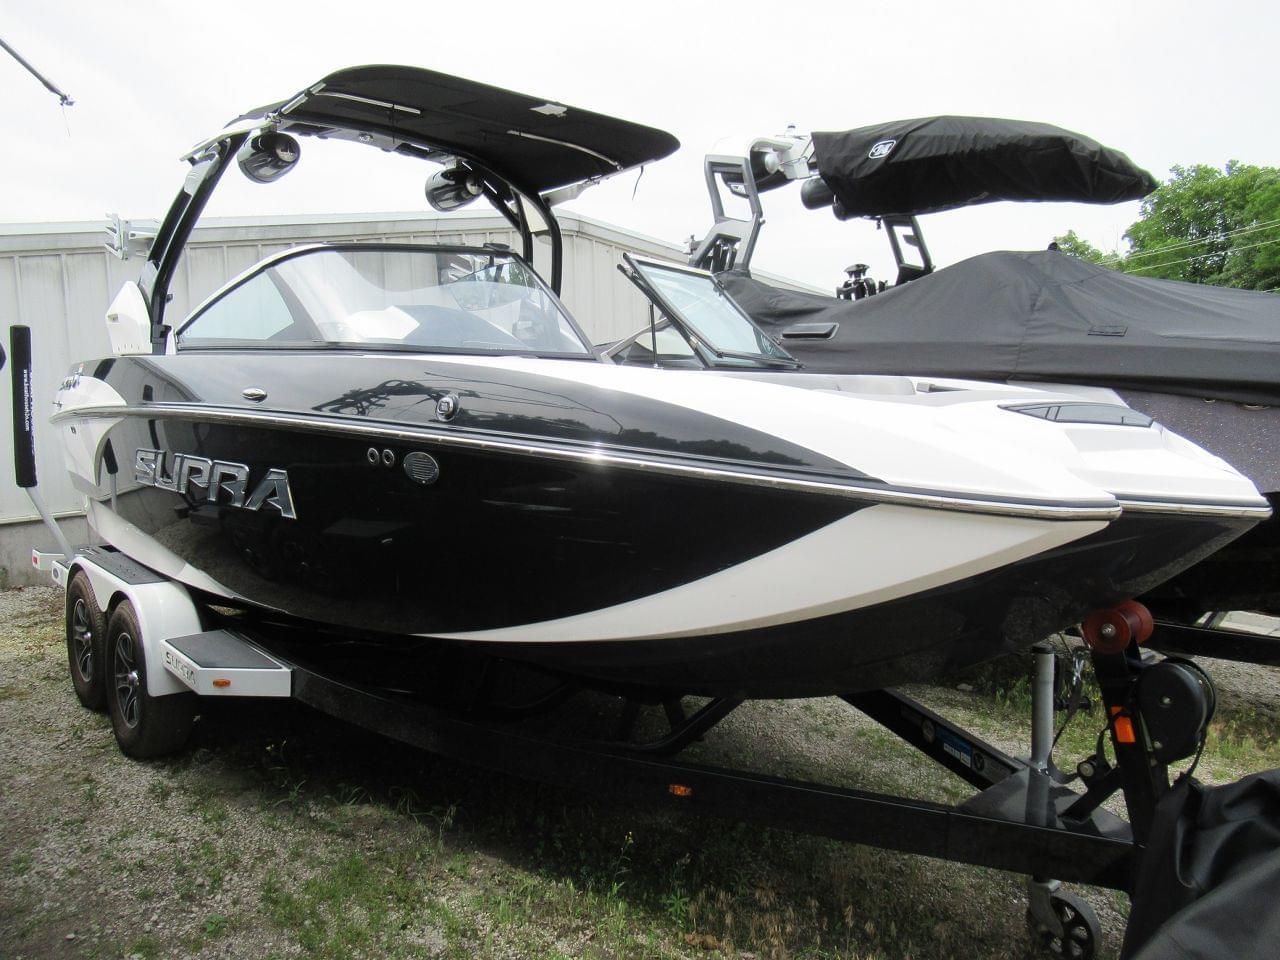 Used 2017 Supra SR400, Stock #UBA2519 - W - The Boat House